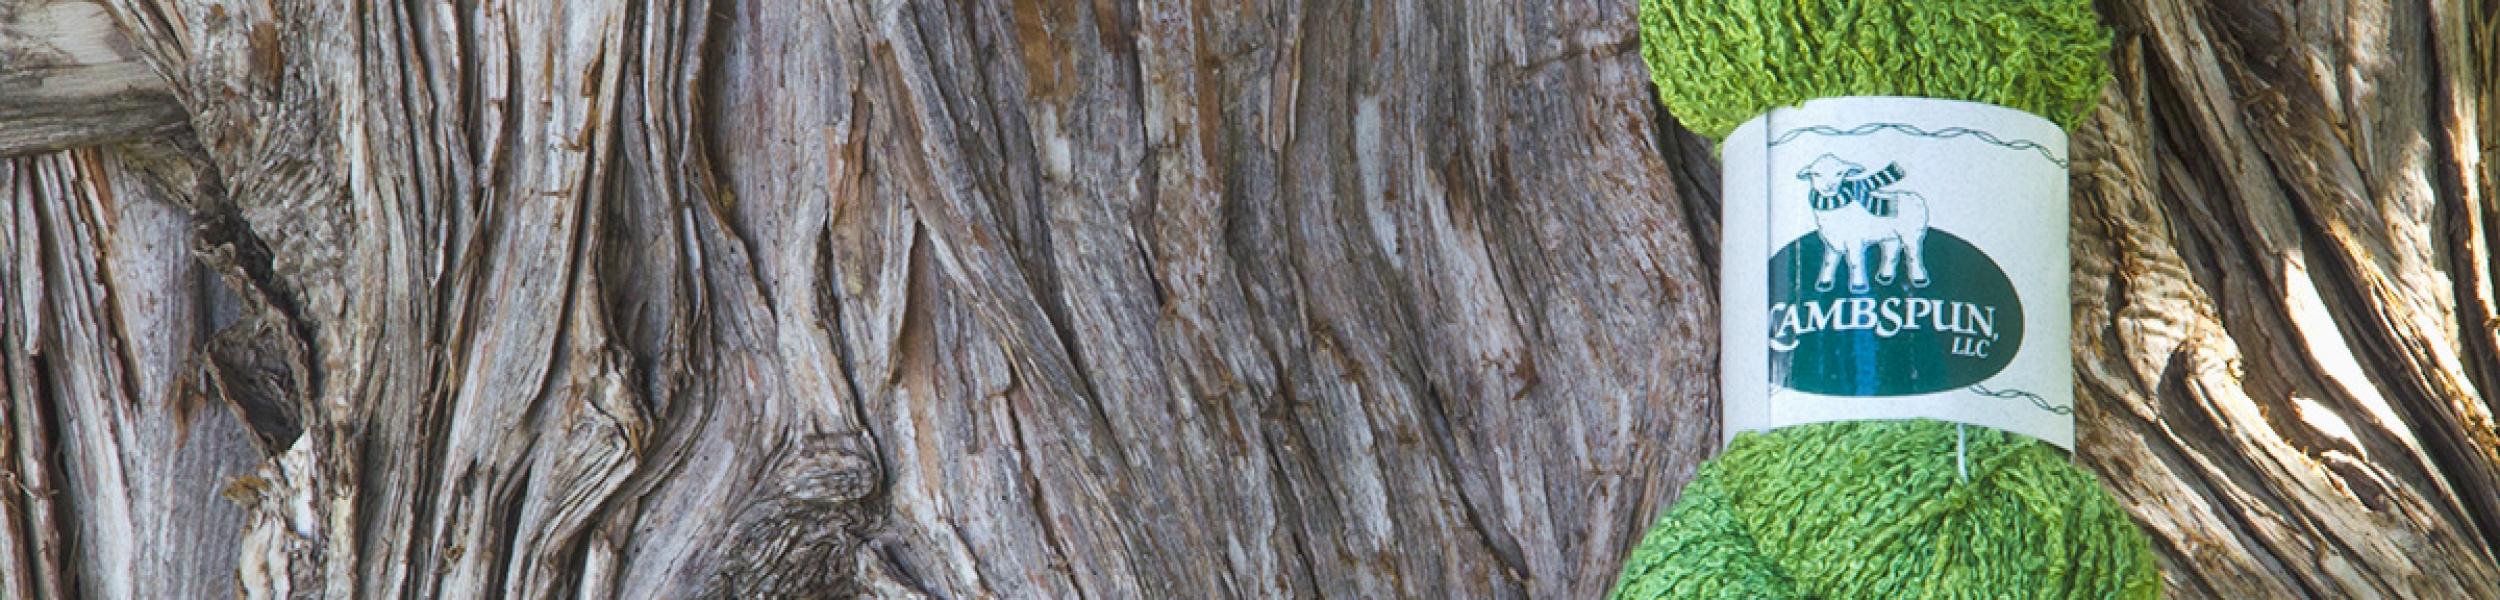 Marcasite Stone copy